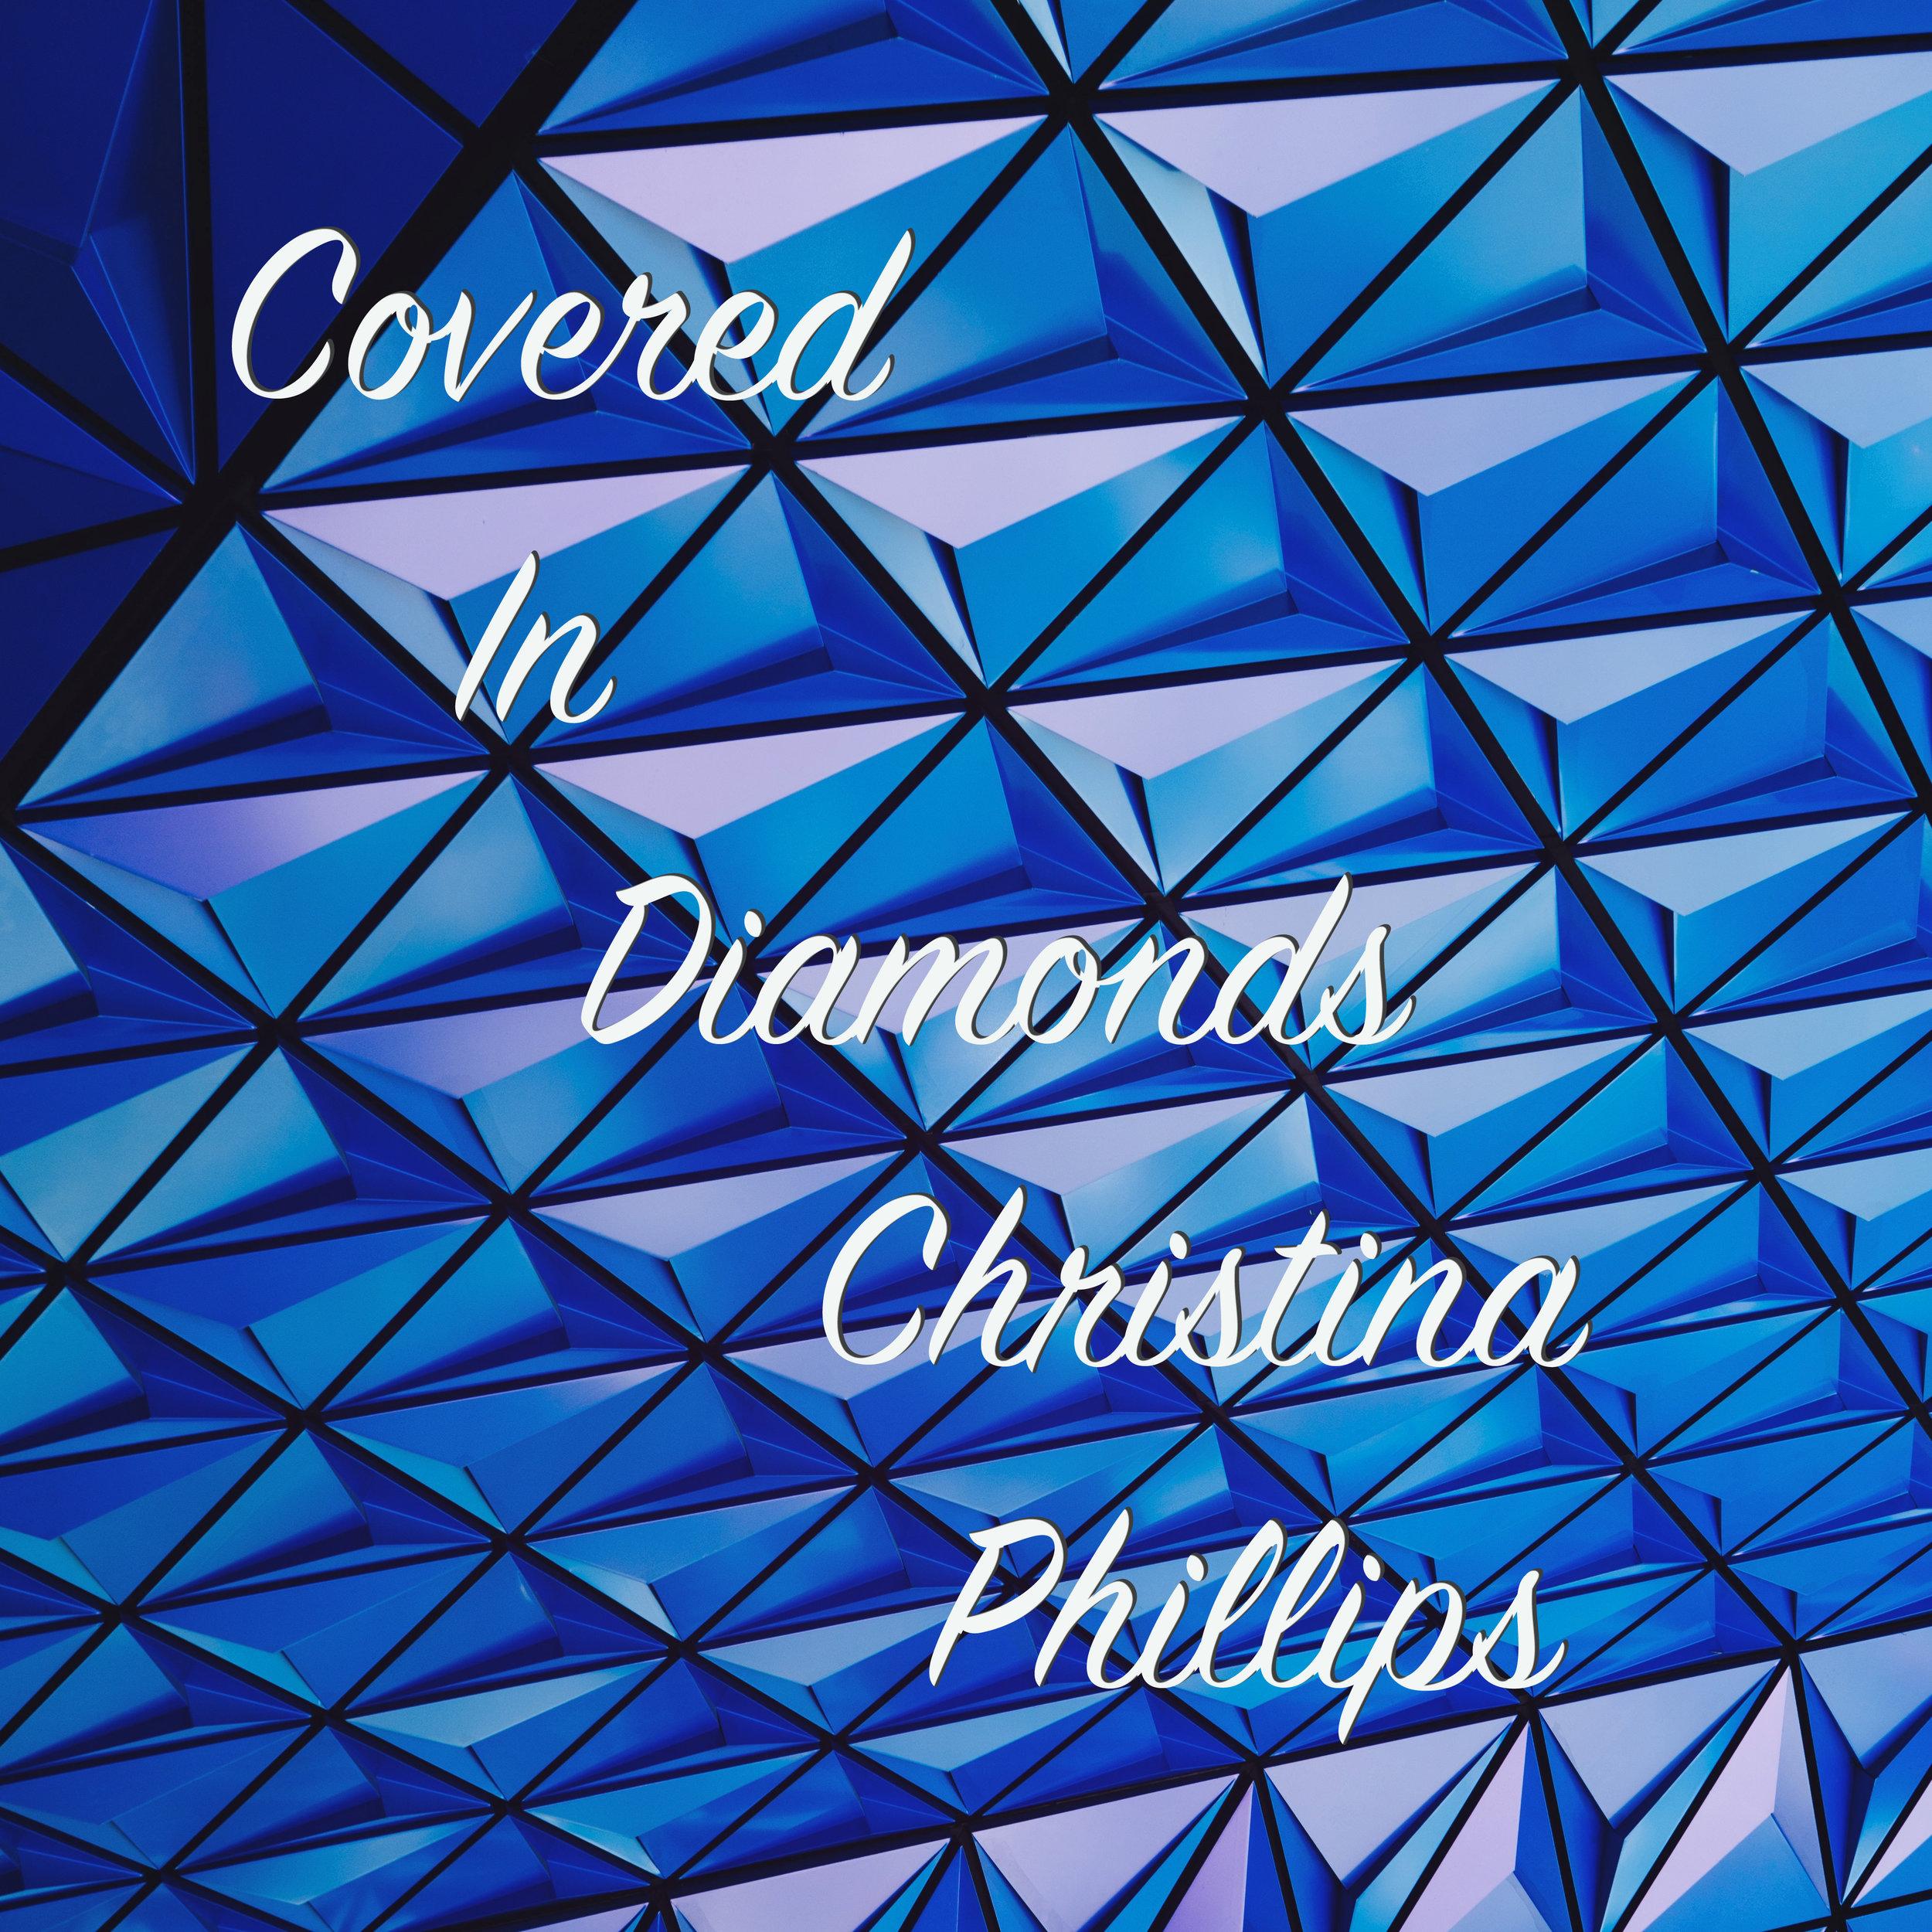 Coverd In Diamonds Cover.jpg